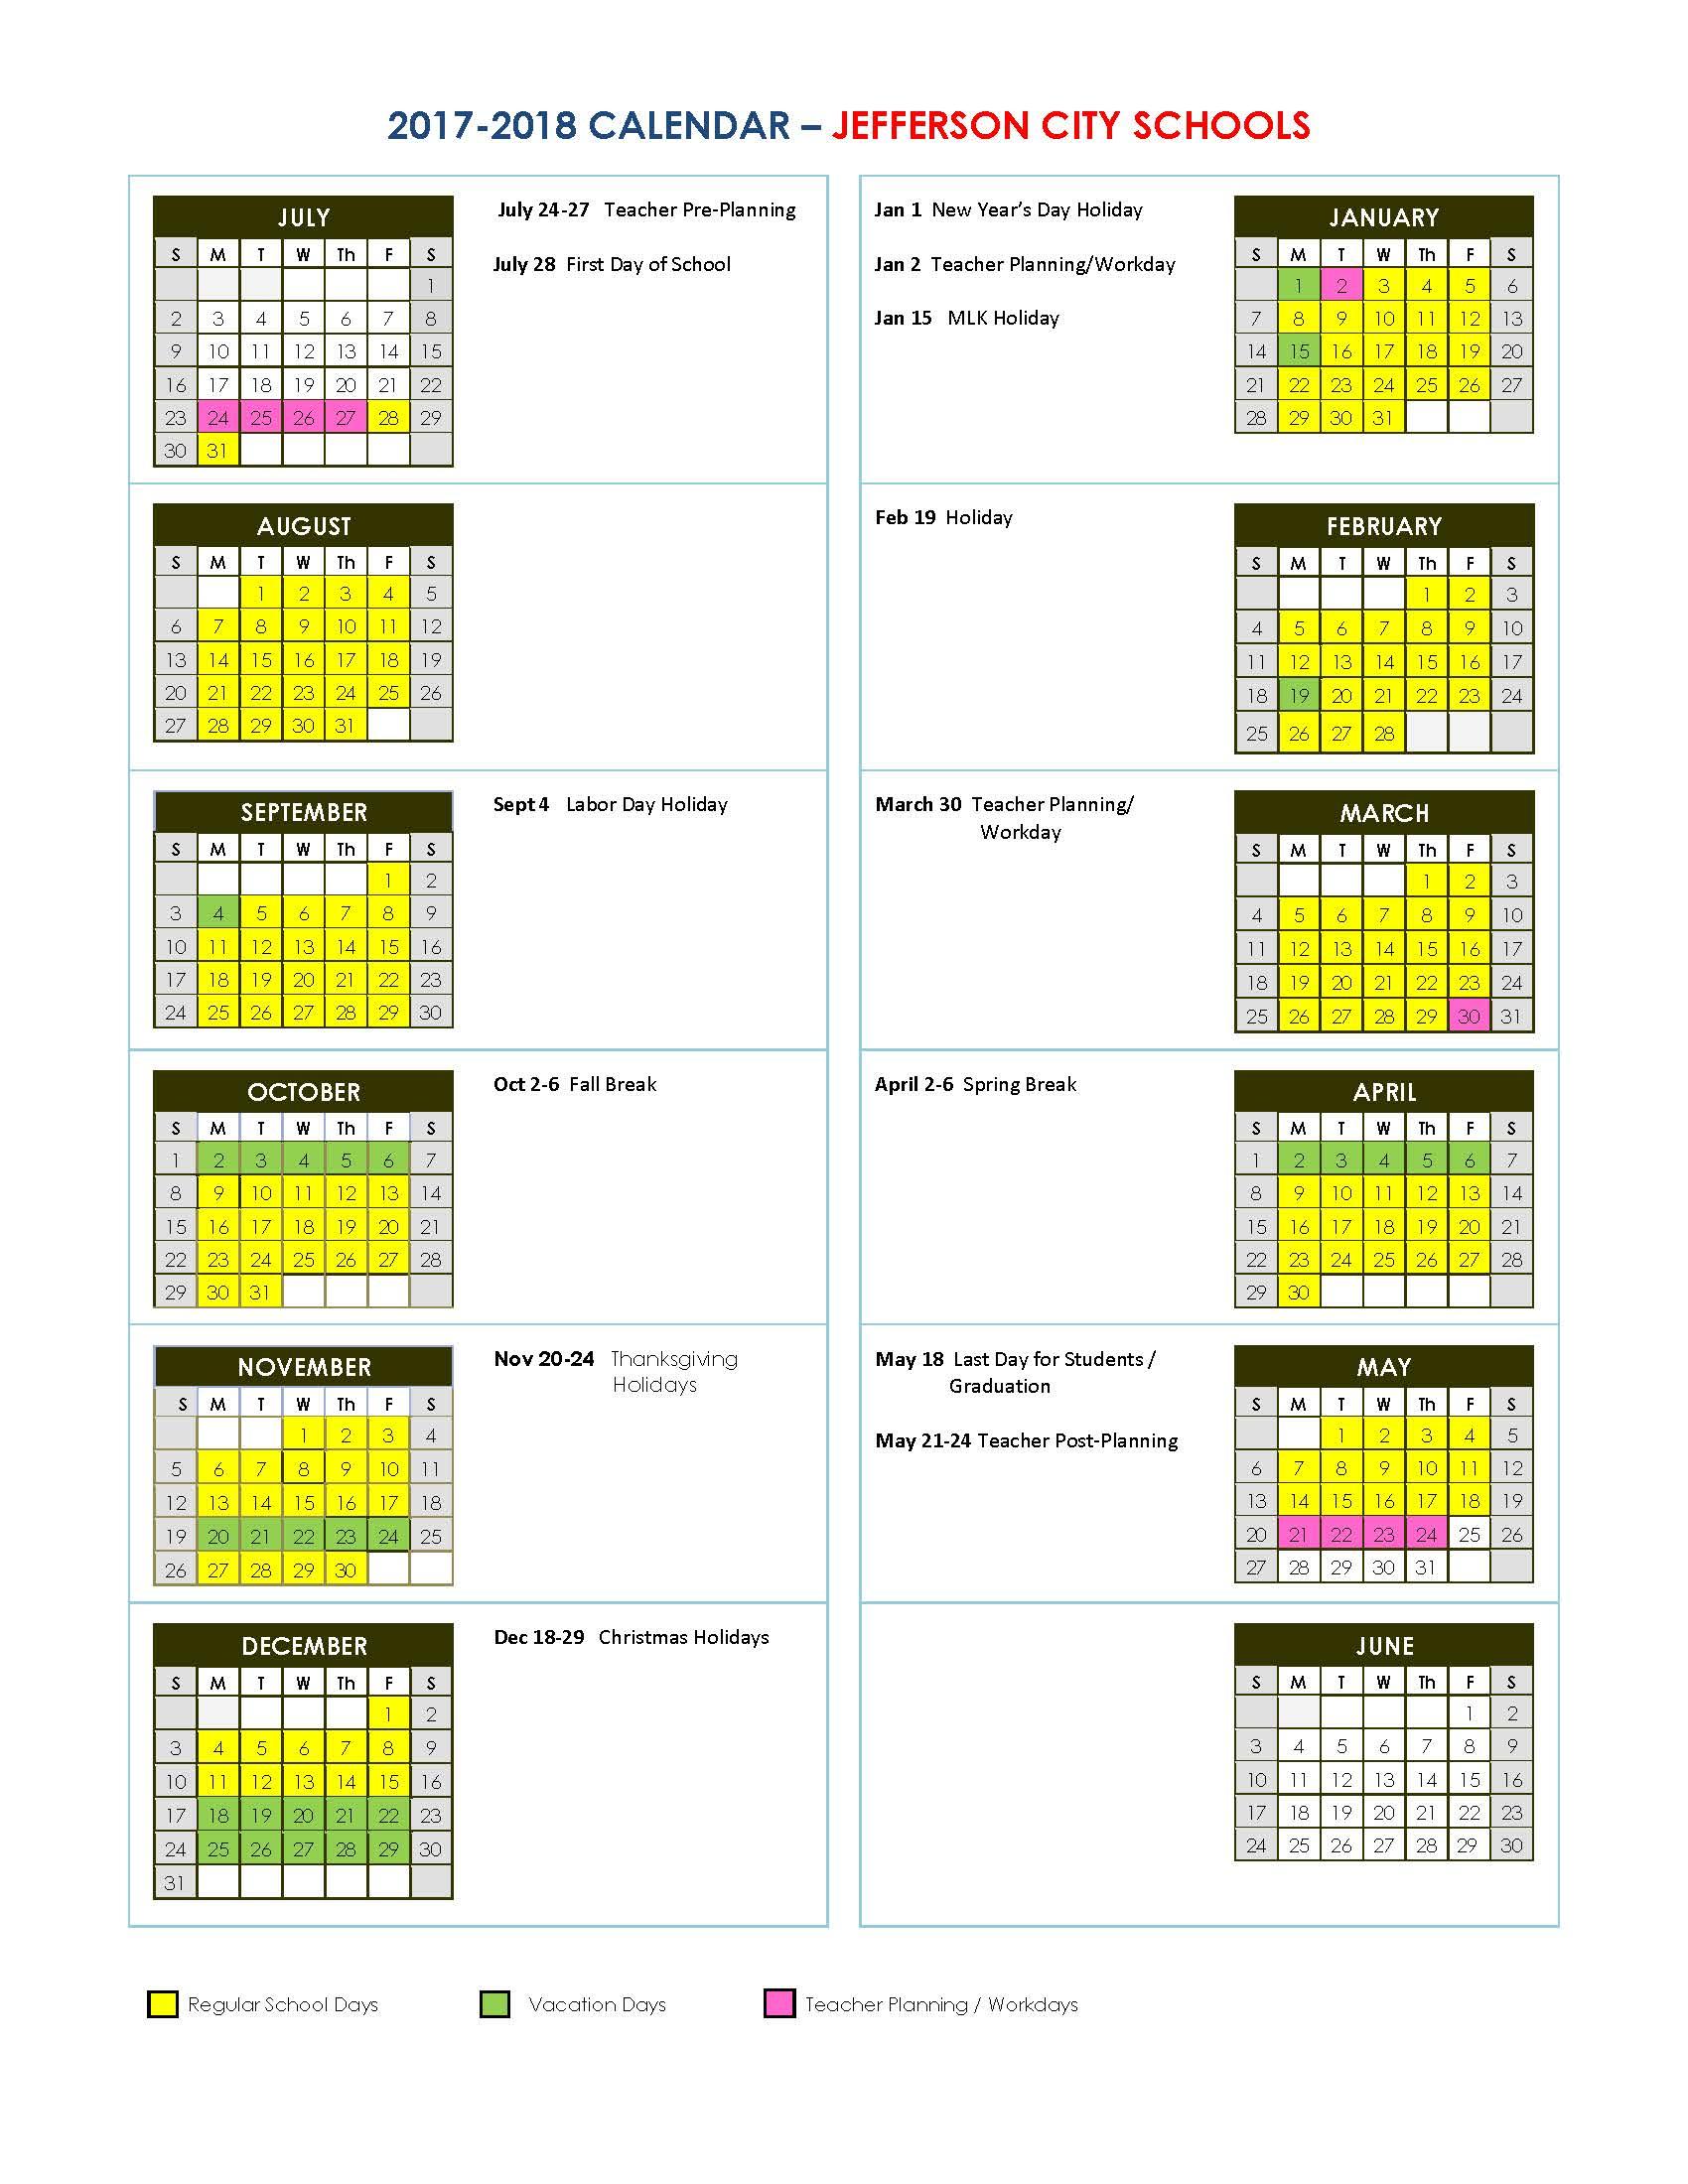 Jefferson City Schools Throughout Athens Clarke County School Schedule